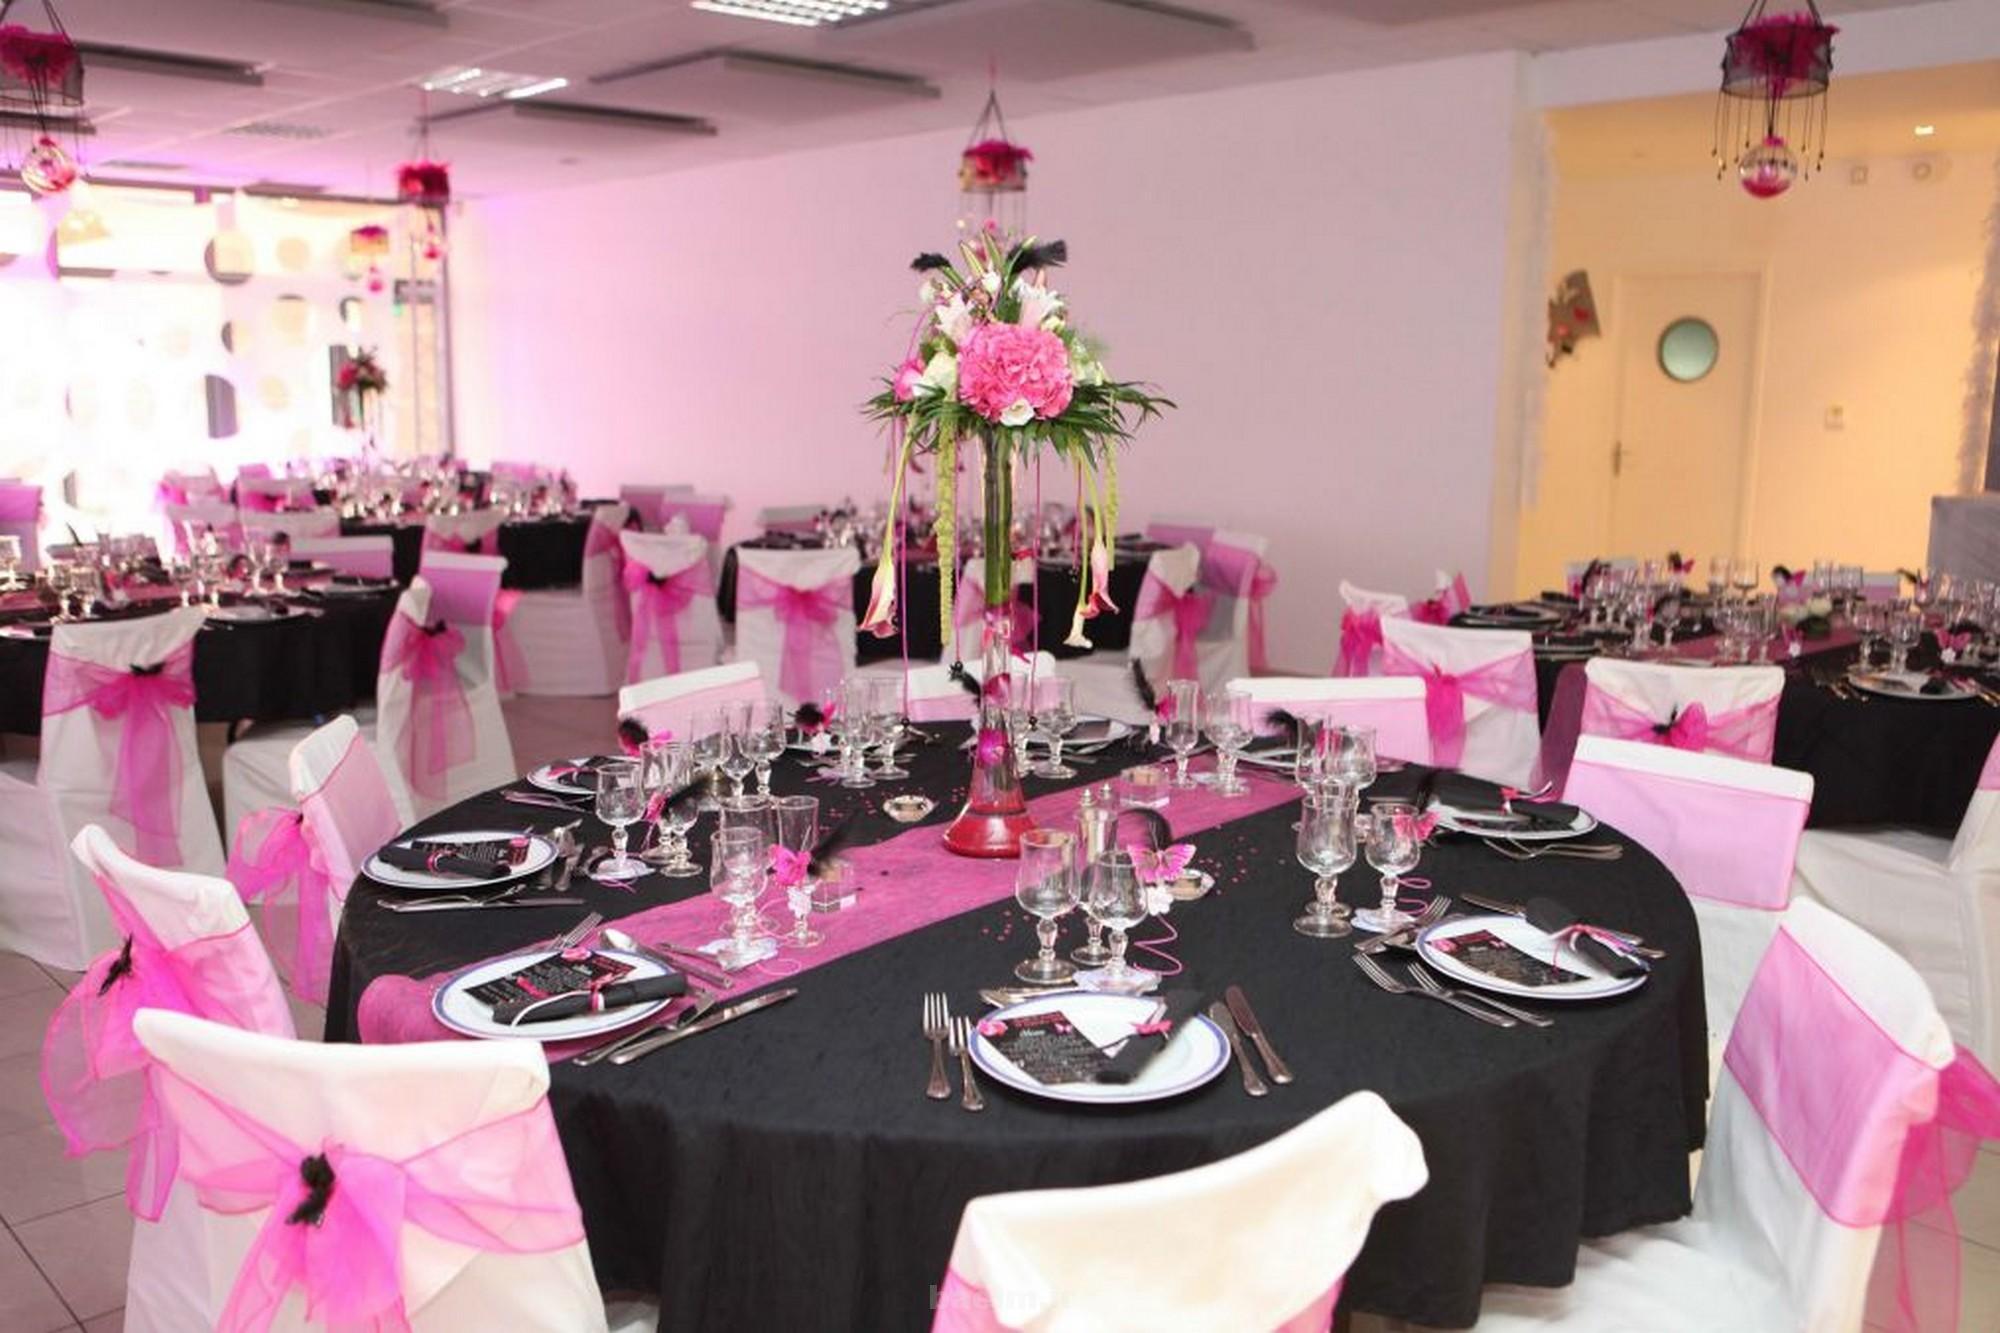 wedding reception decorations 18 Wedding Reception Decorations